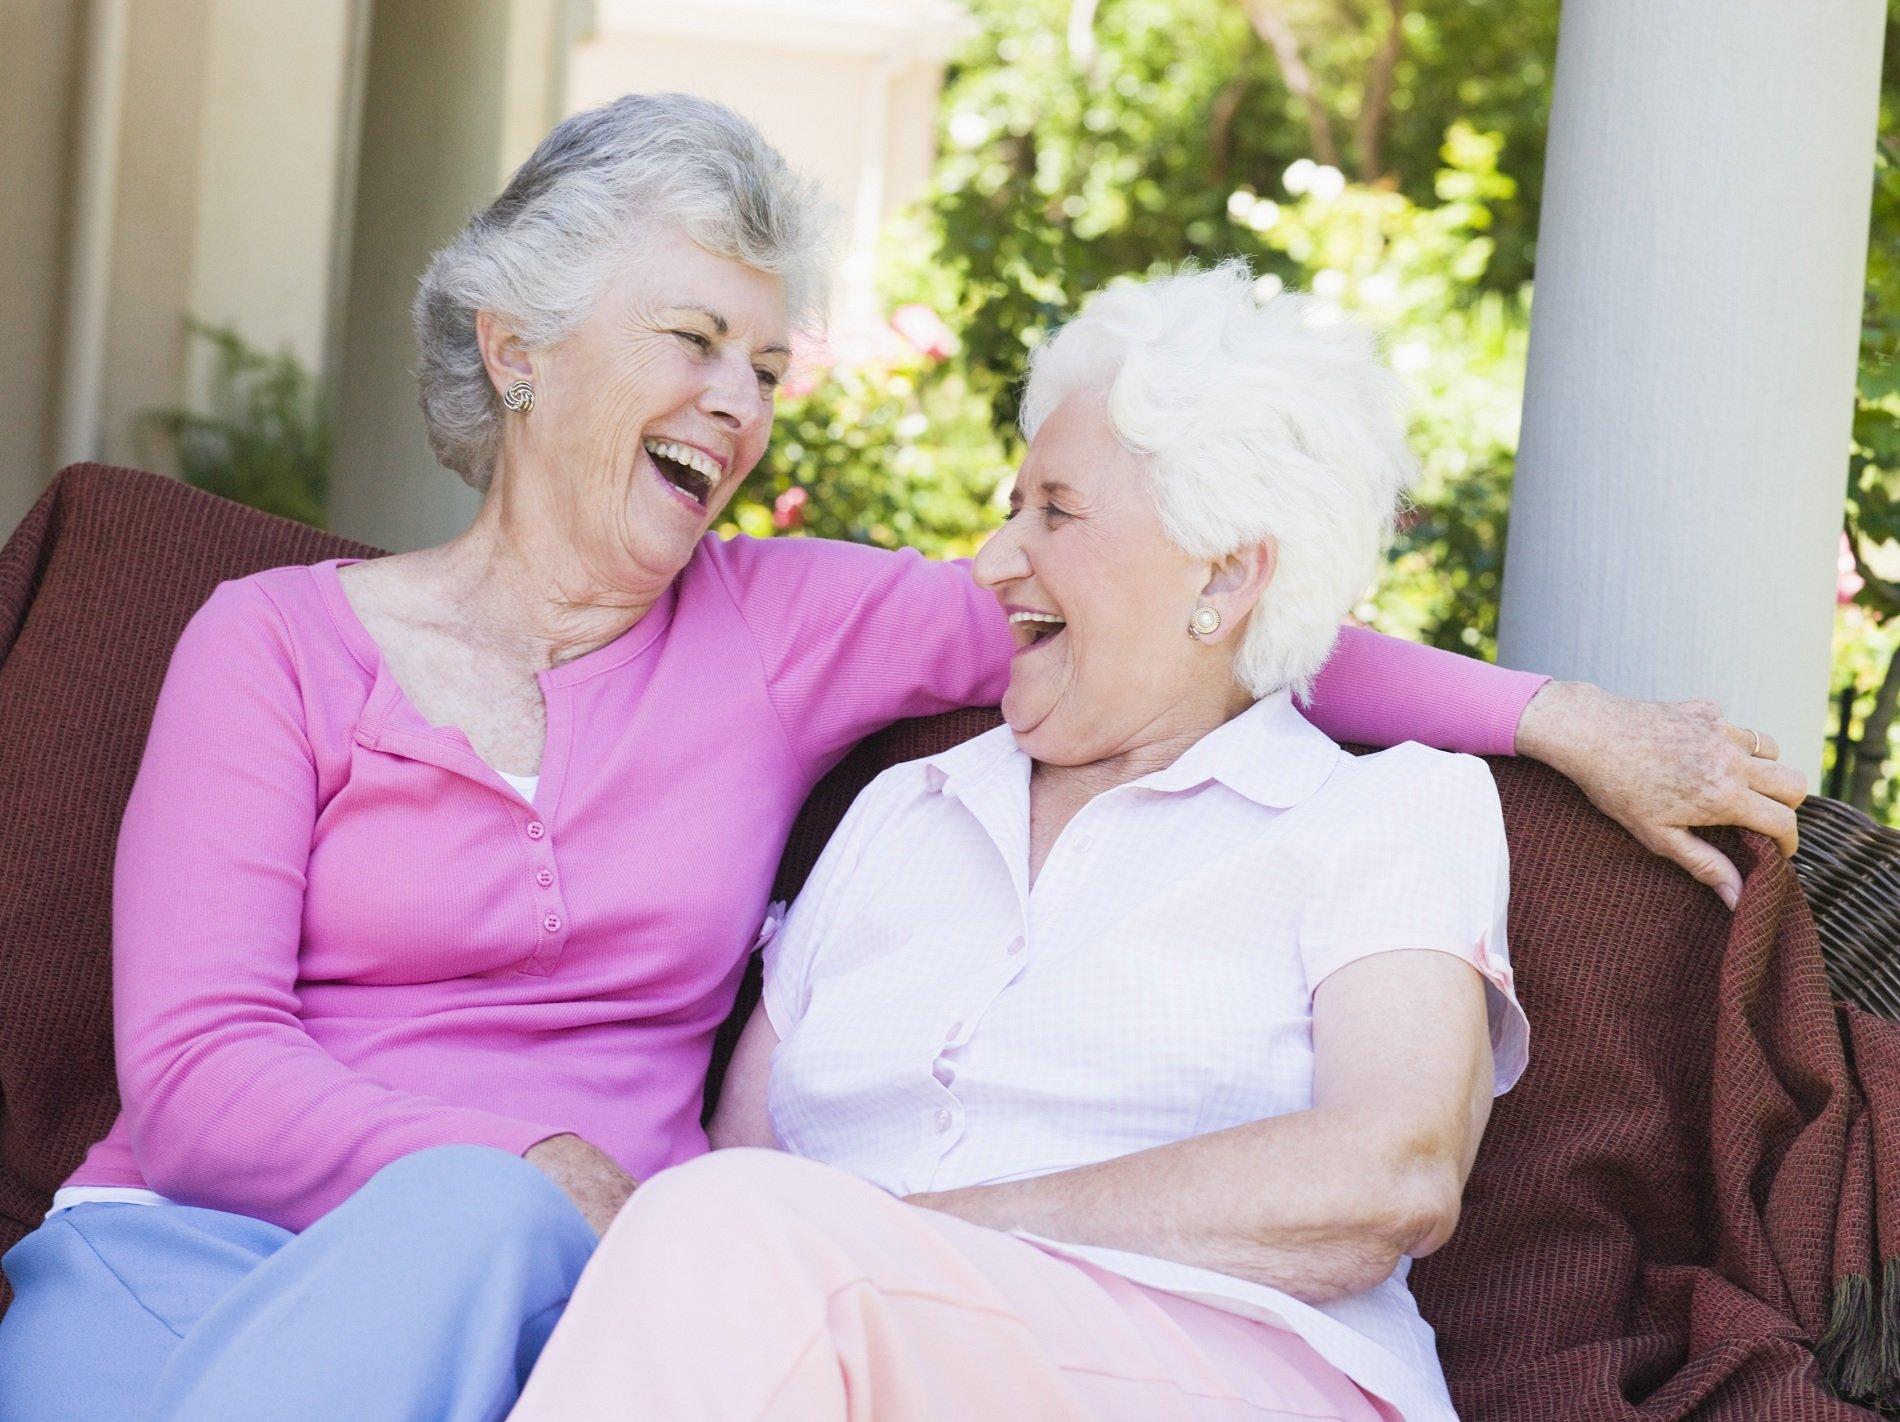 due donne anziane ridono